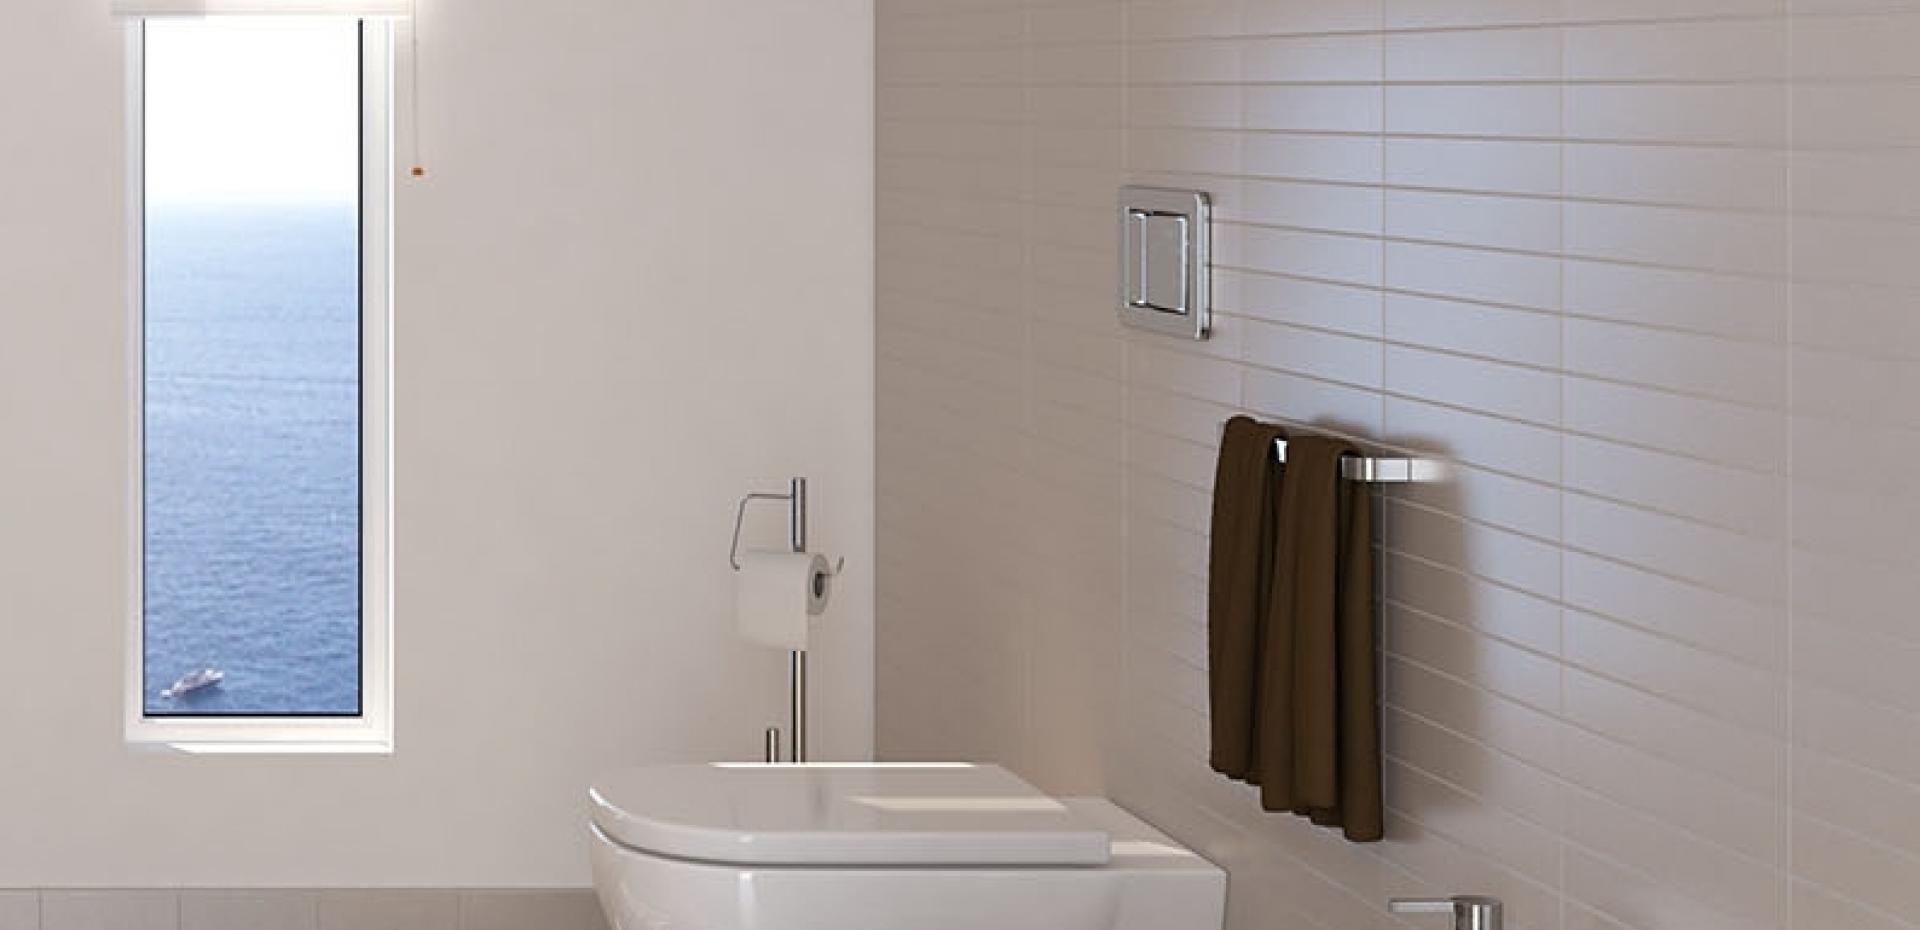 Piastrelle interni vogue system piastrelle per bagno e cucina - Piastrelle cucina ...